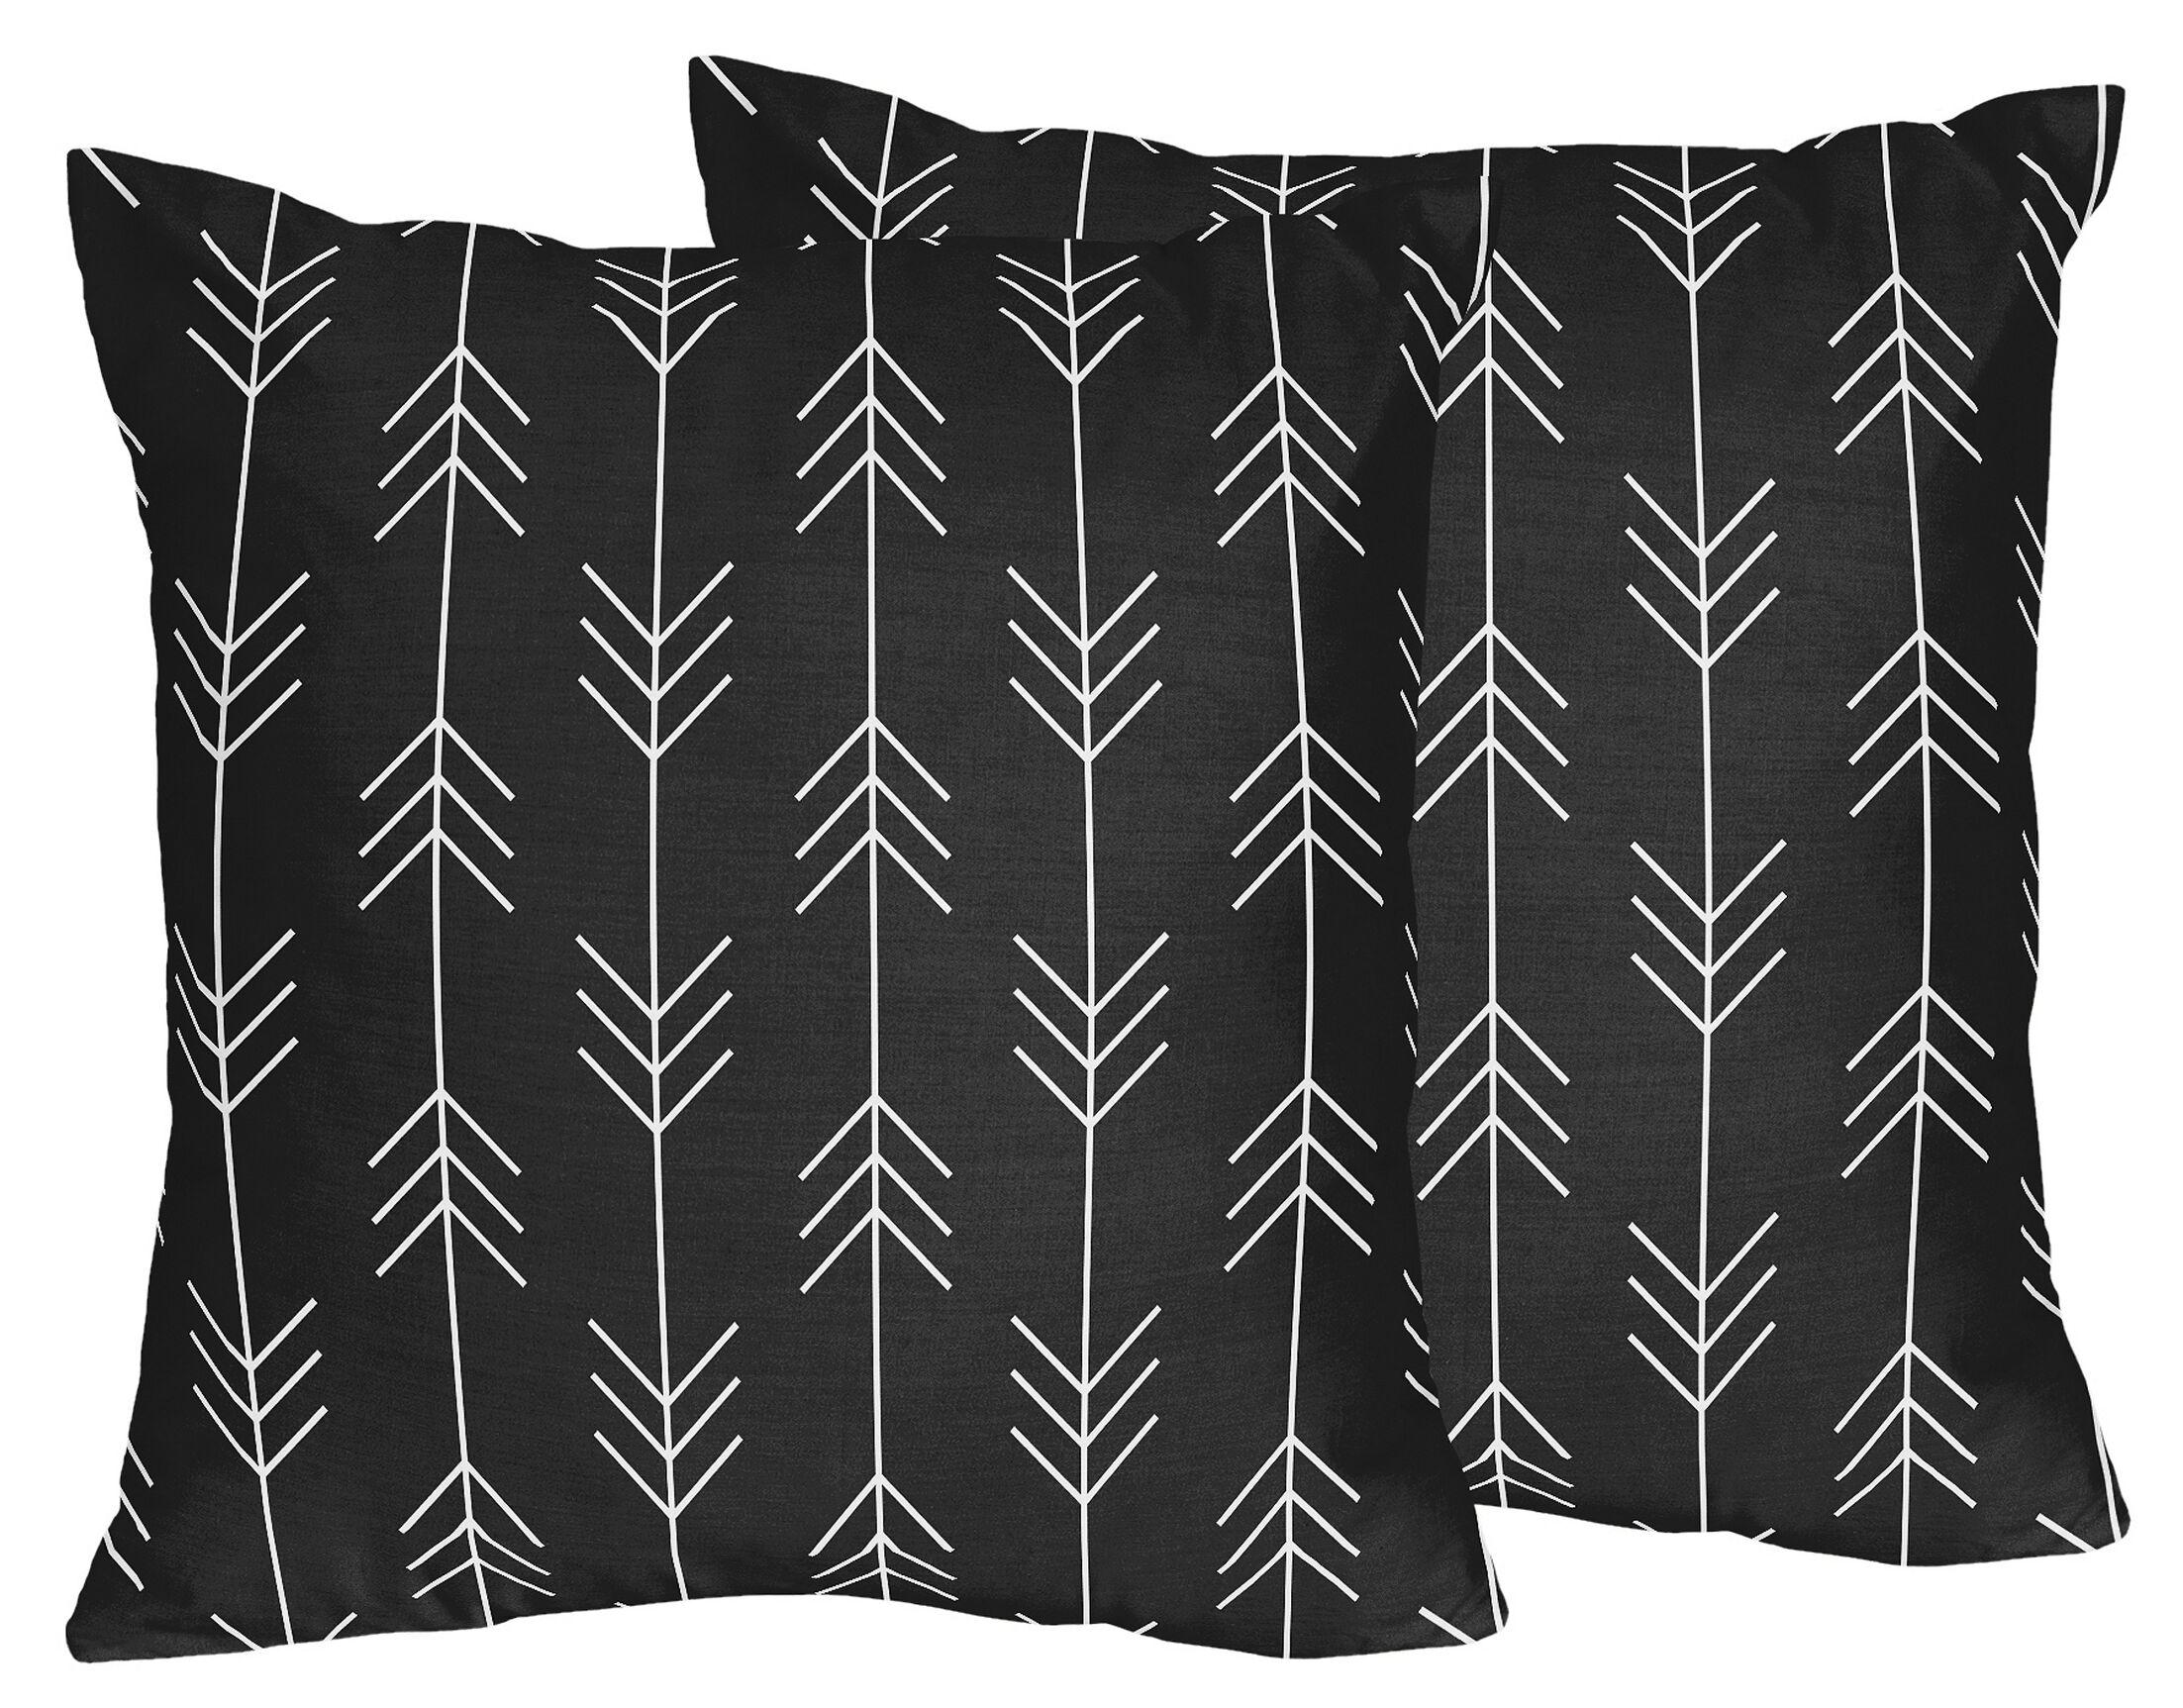 Rustic Patch Arrow Throw Pillows